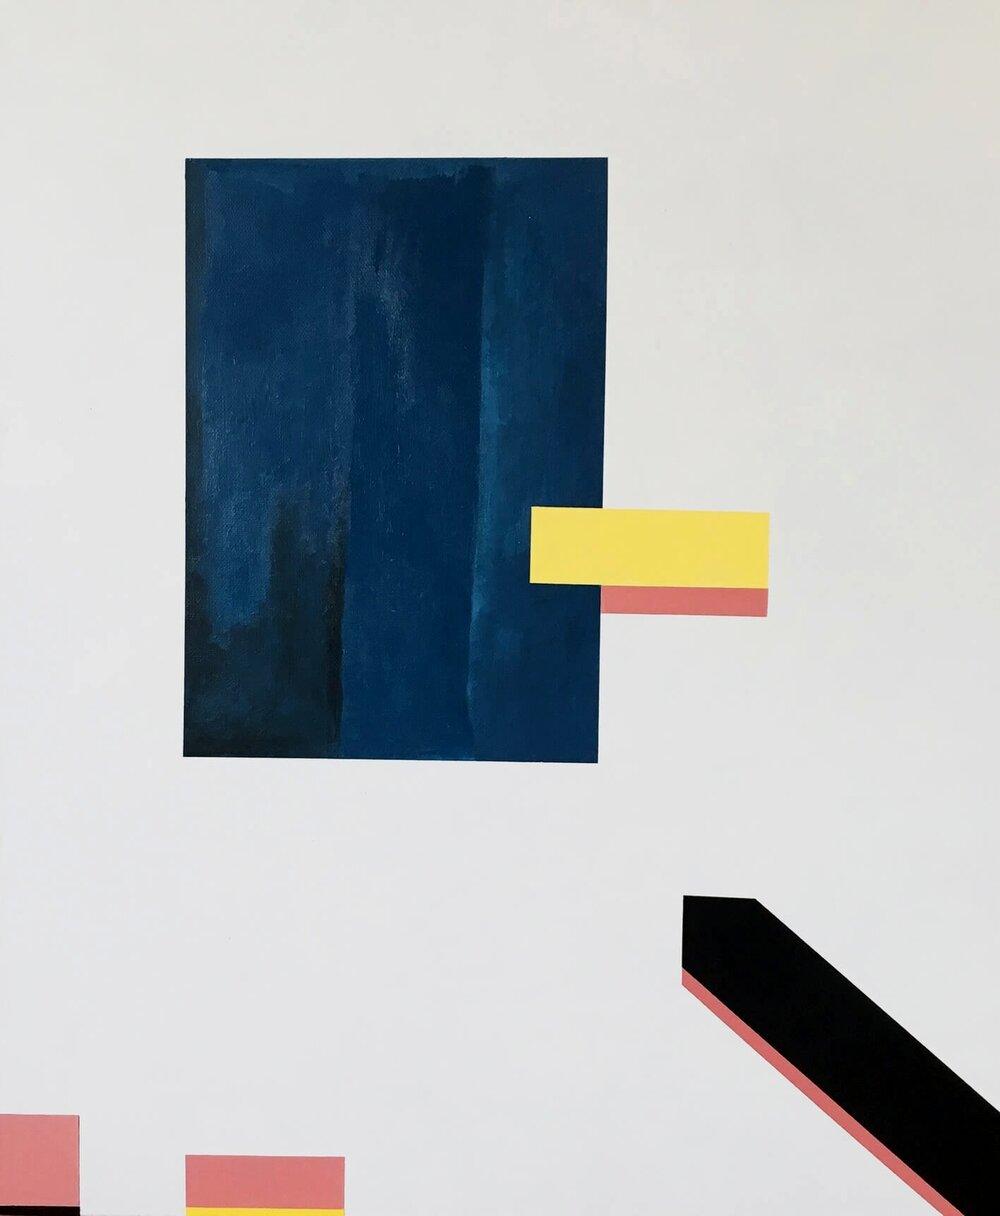 Minimal 10, 60 cm x 50 x 4 cm, Acryl auf Leinwand, © Ute Latzke, 2016, Preis: 300 Euro.